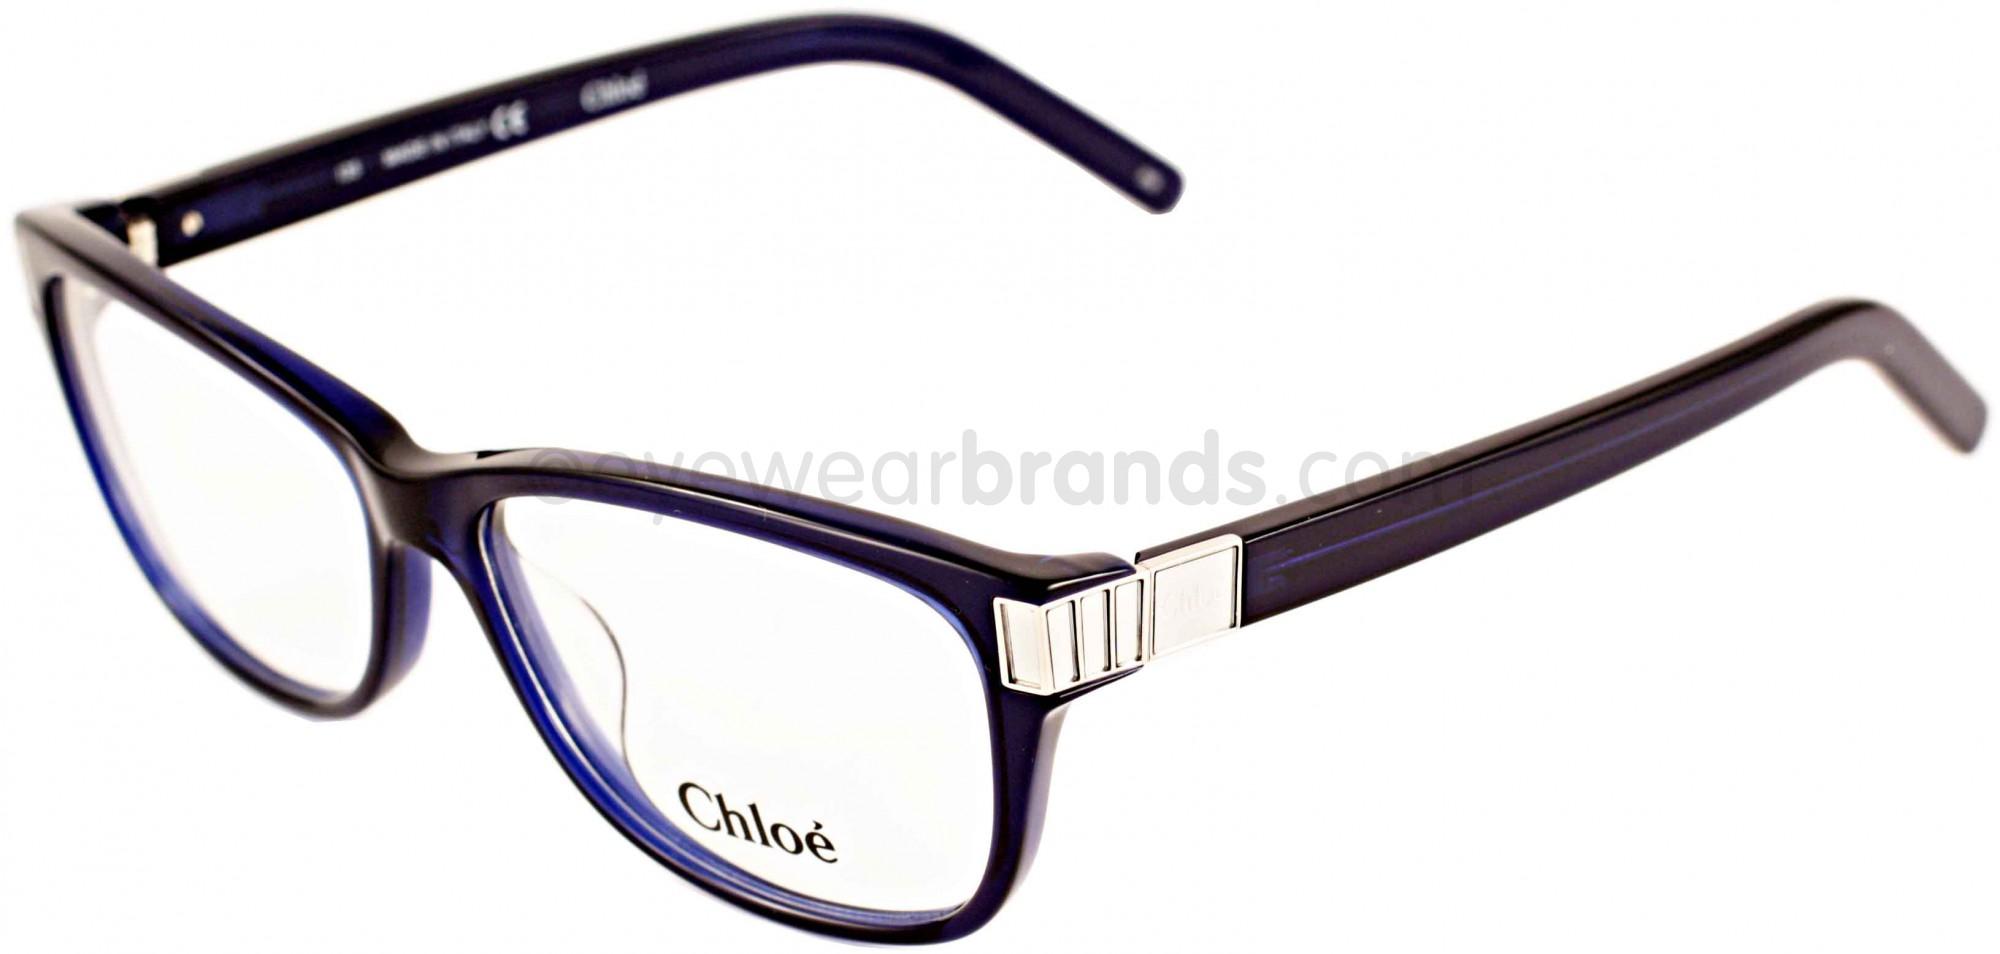 877e3cd84a5c Introducing Chloe eyewear